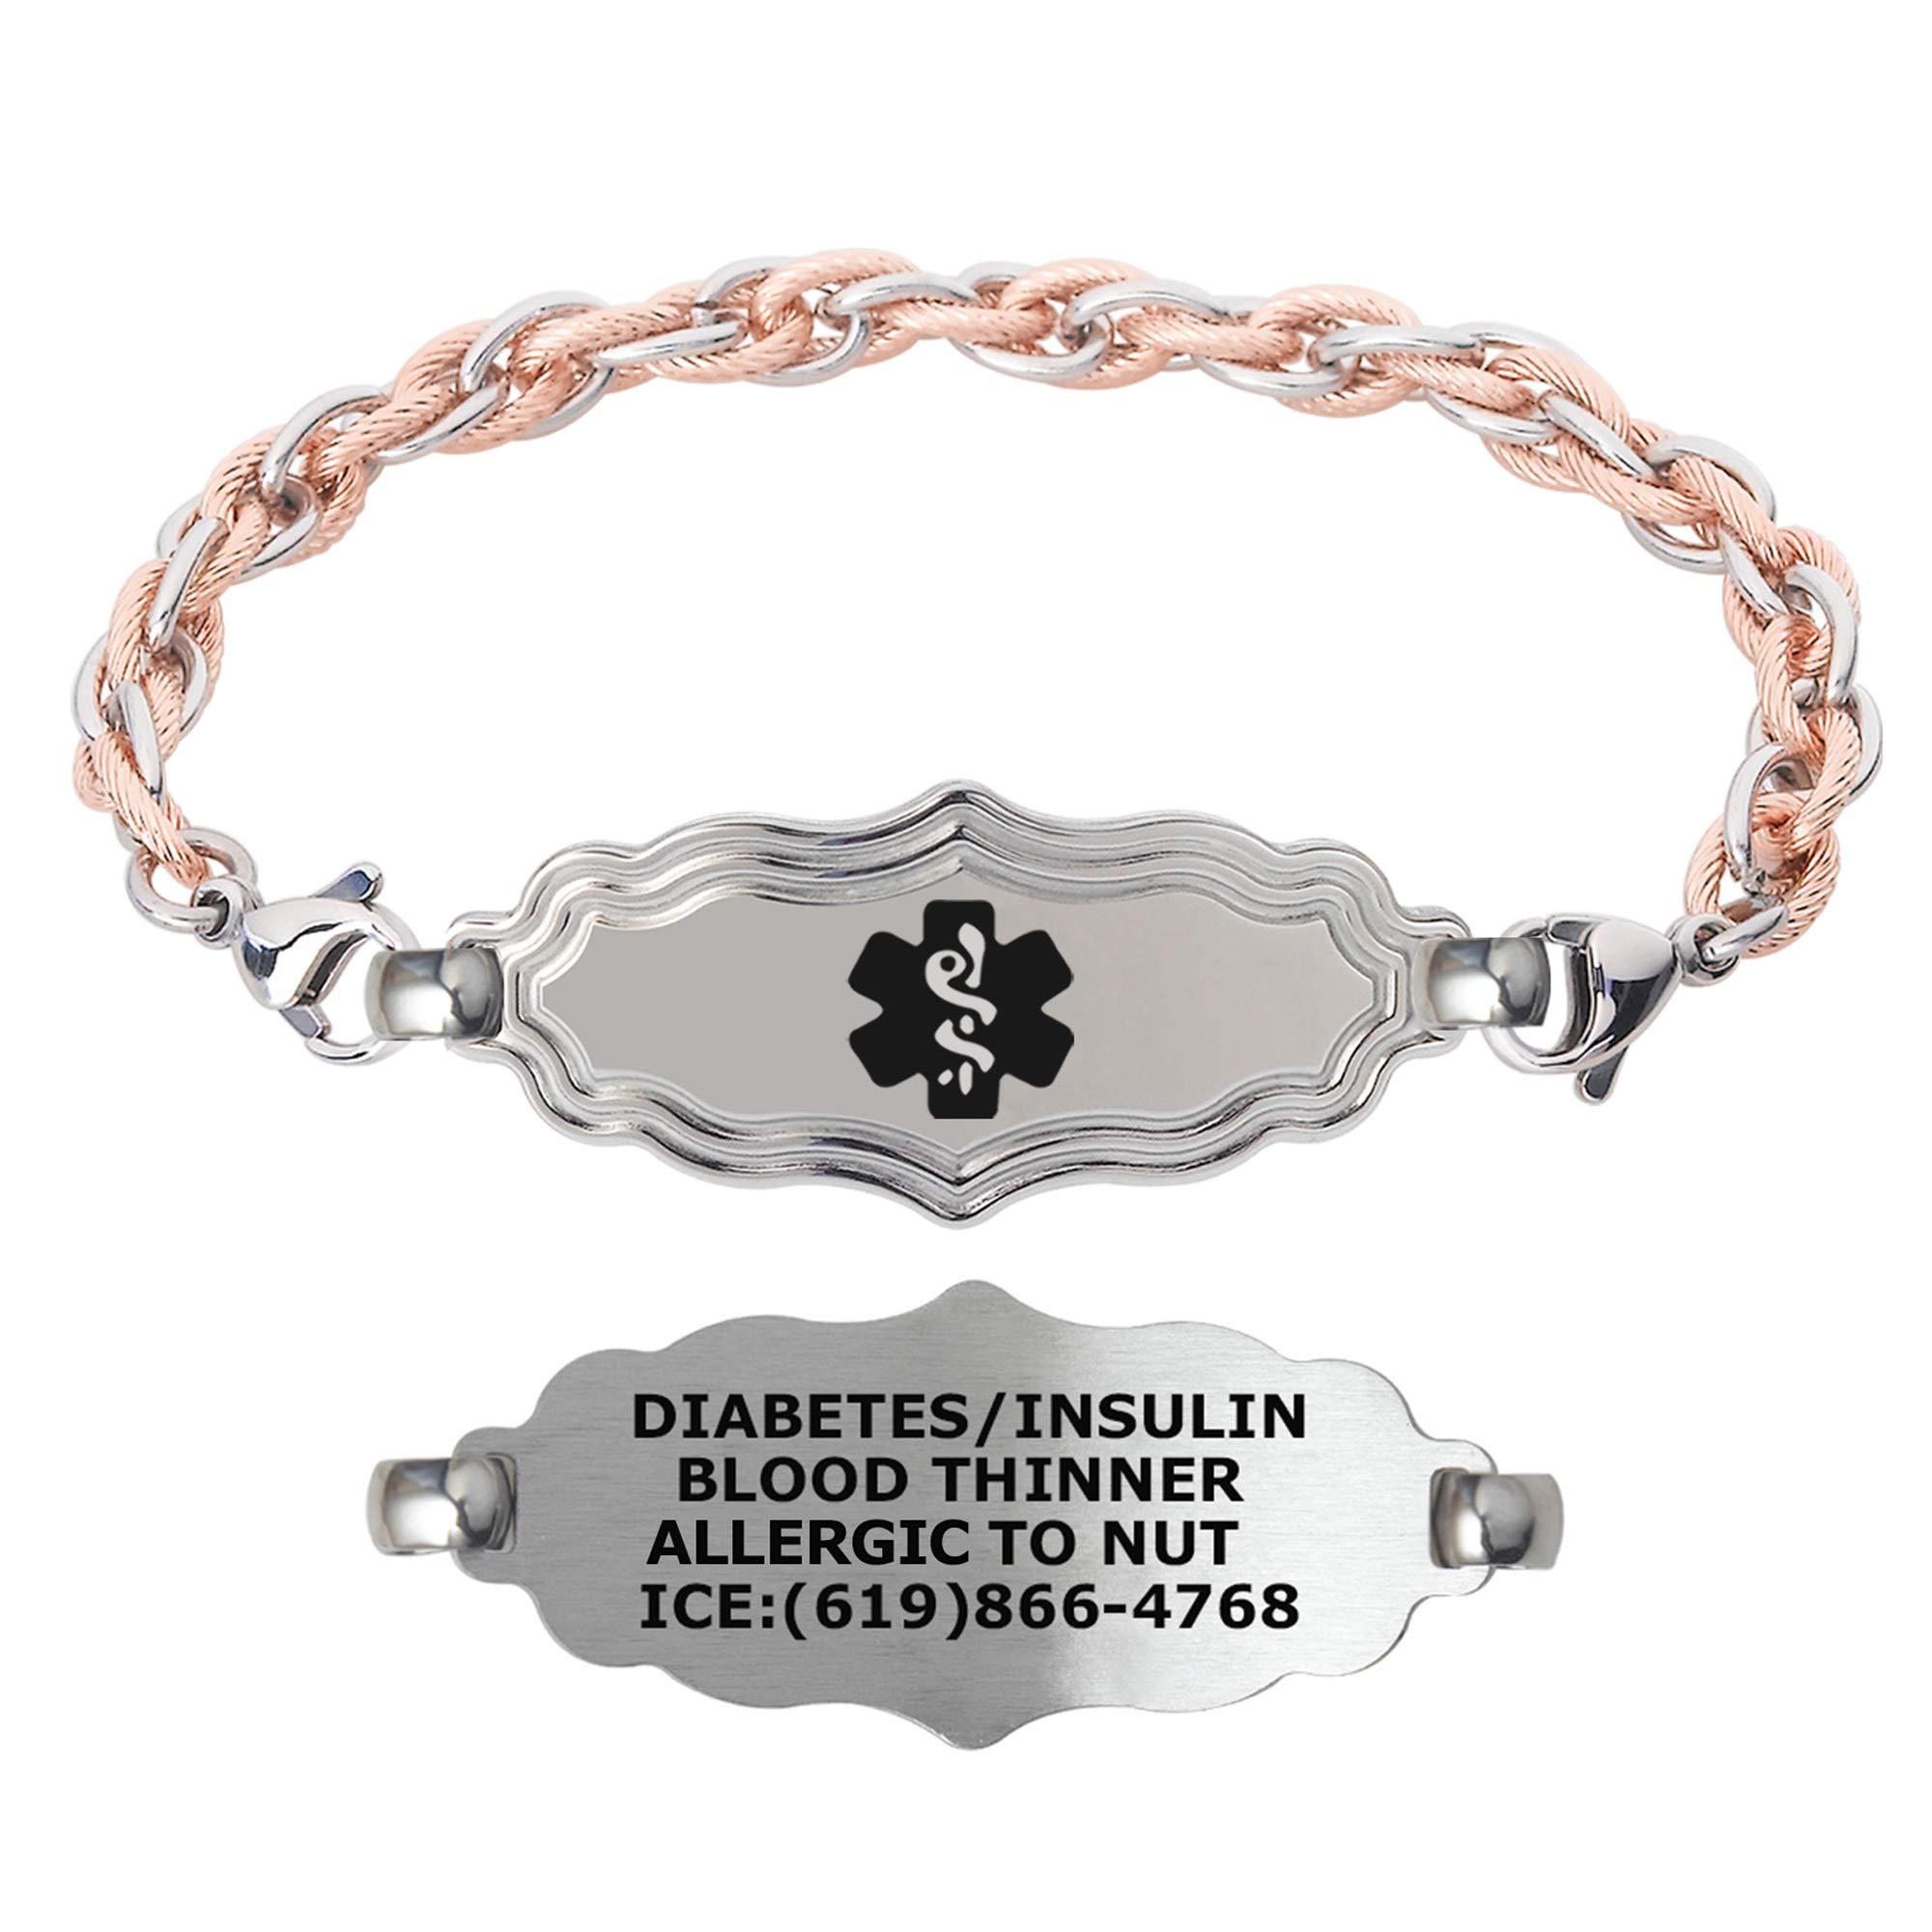 Divoti Custom Engraved Medical Alert Bracelets for Women, Stainless Steel Medical Bracelet, Medical ID Bracelet w/Free Engraving – Victorian Art Deco Tag w/Inter-Mesh Rose Gold/Silver – Color/Size